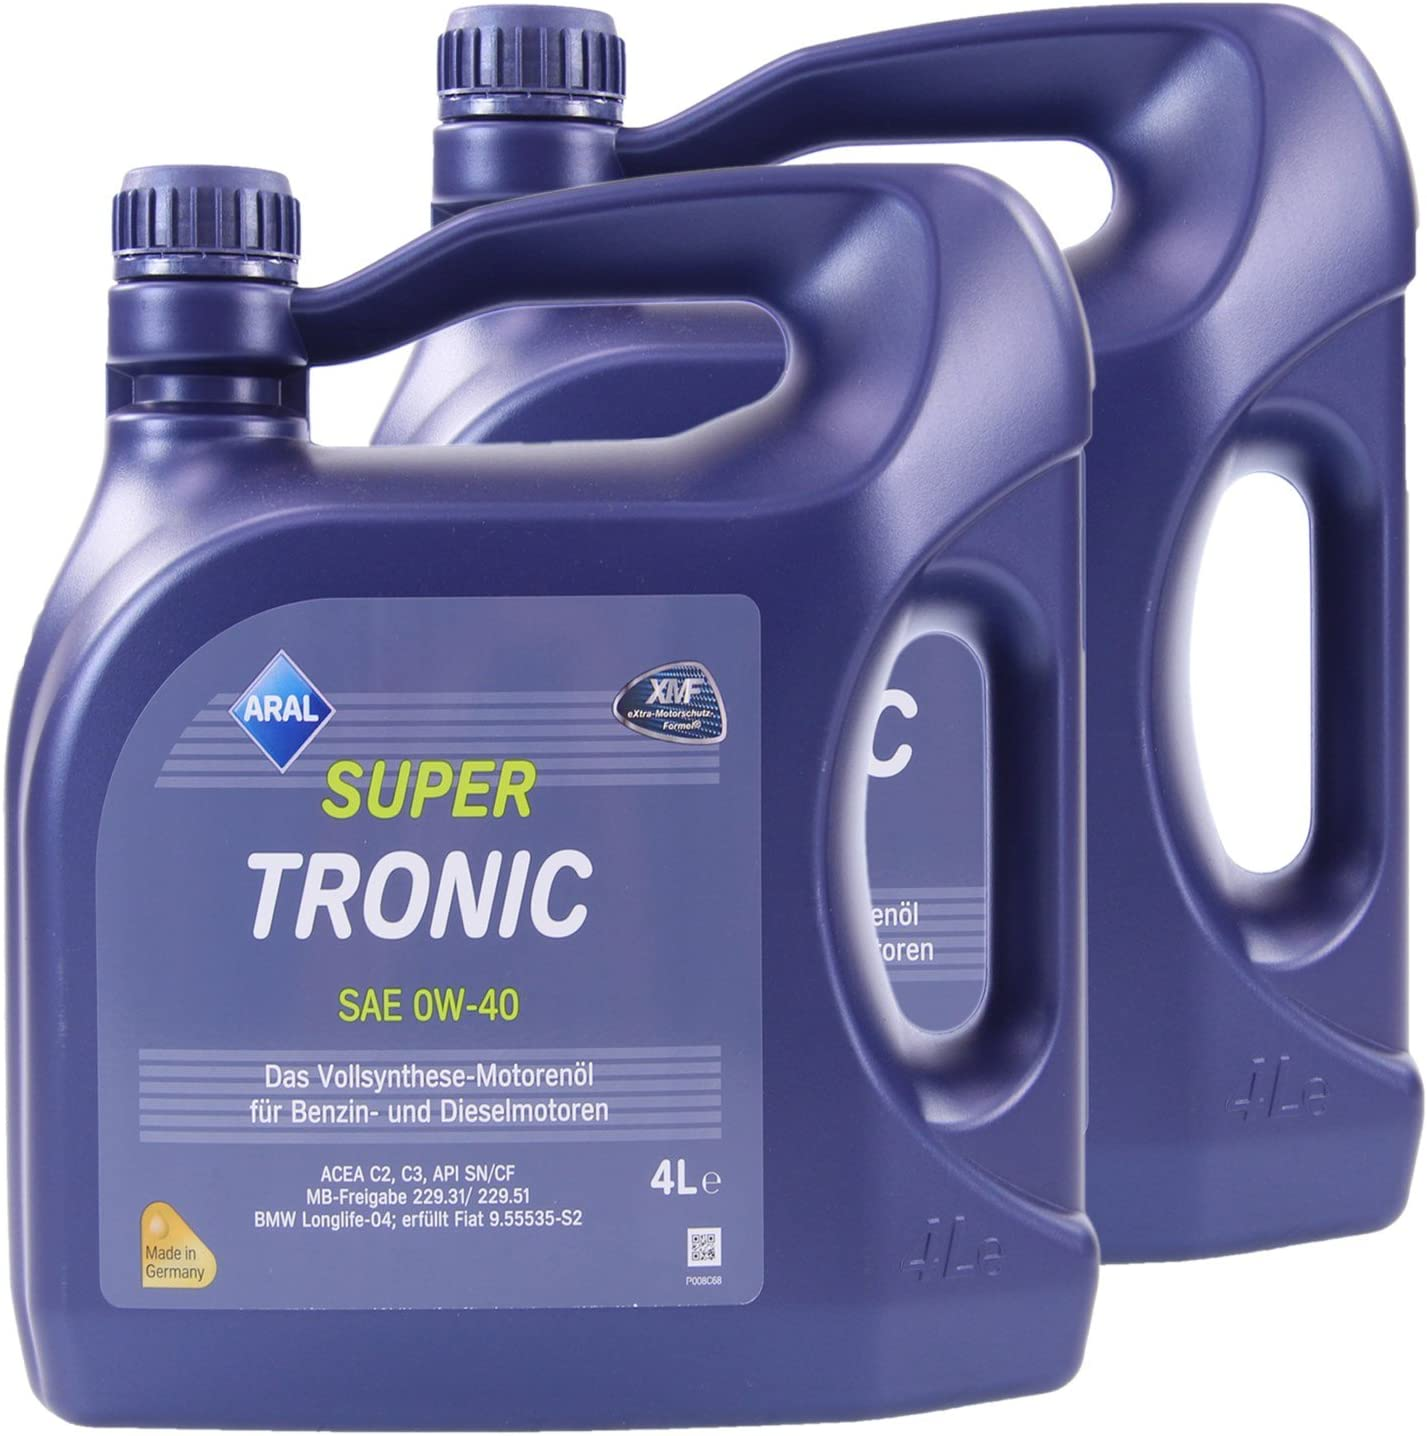 2x 4 L 8 Liter Aral Supertronic 0w 40 Motoröl Auto